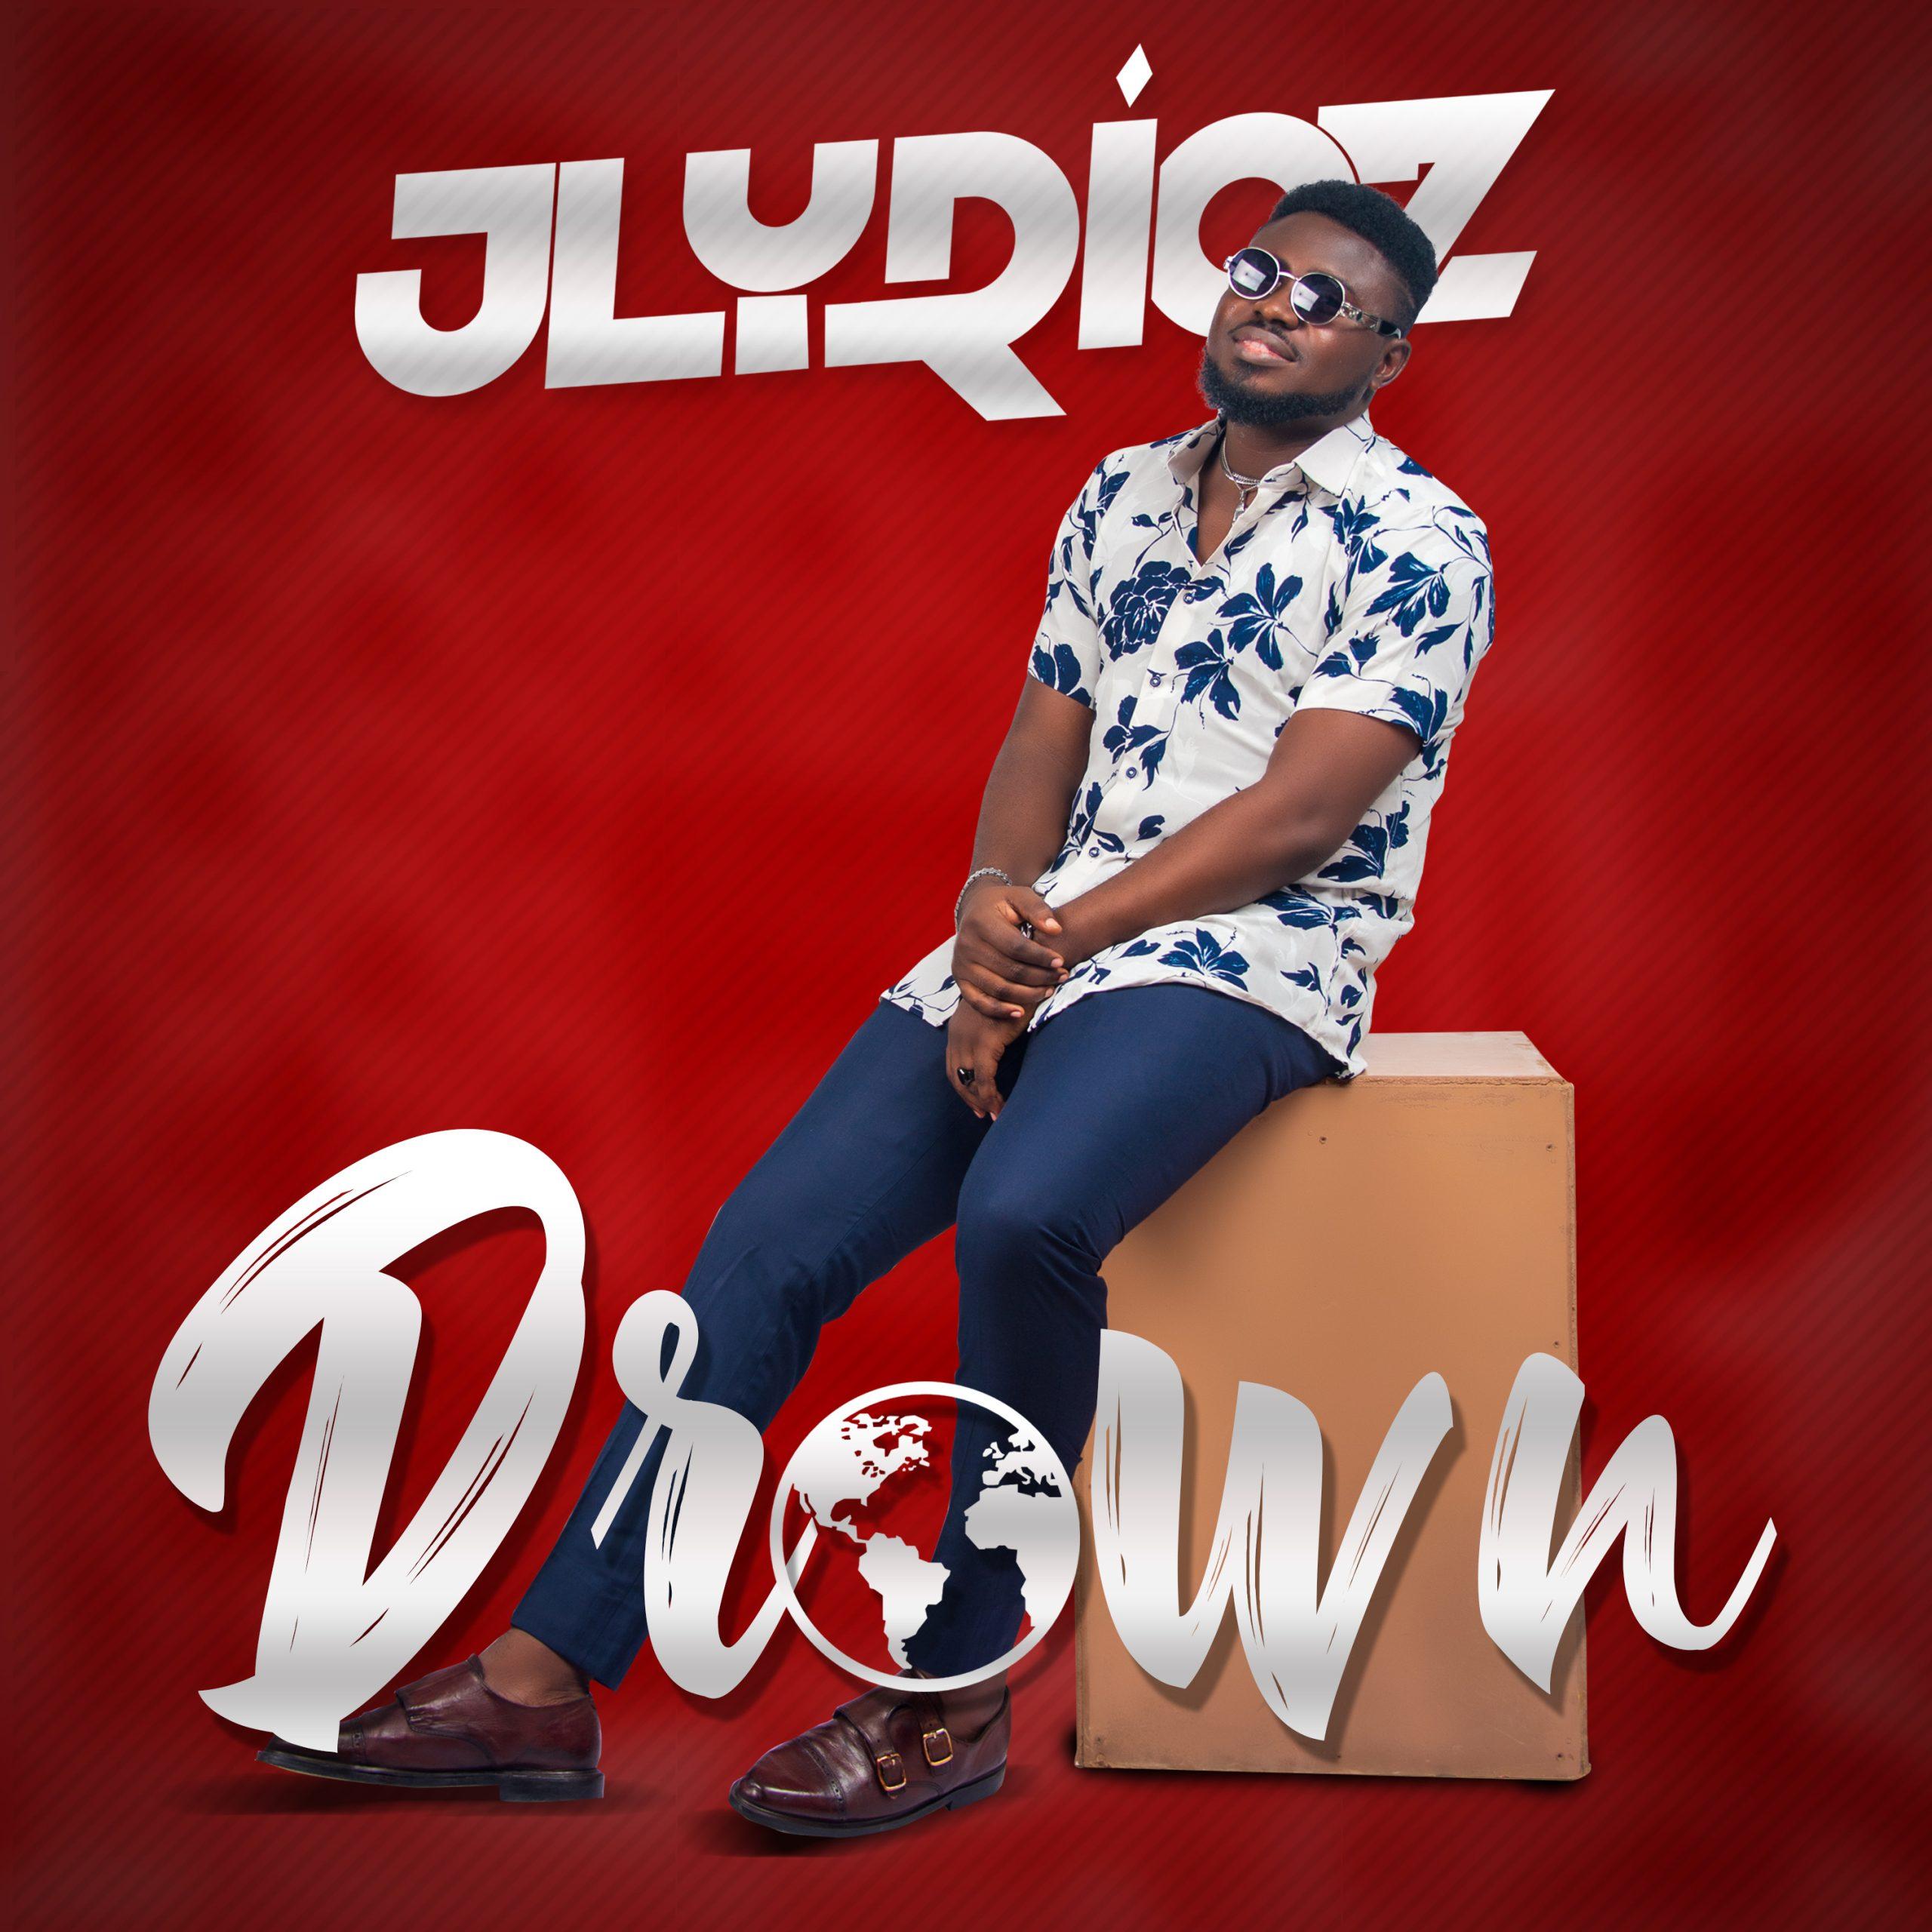 Music Video: Jlyricz - Drown